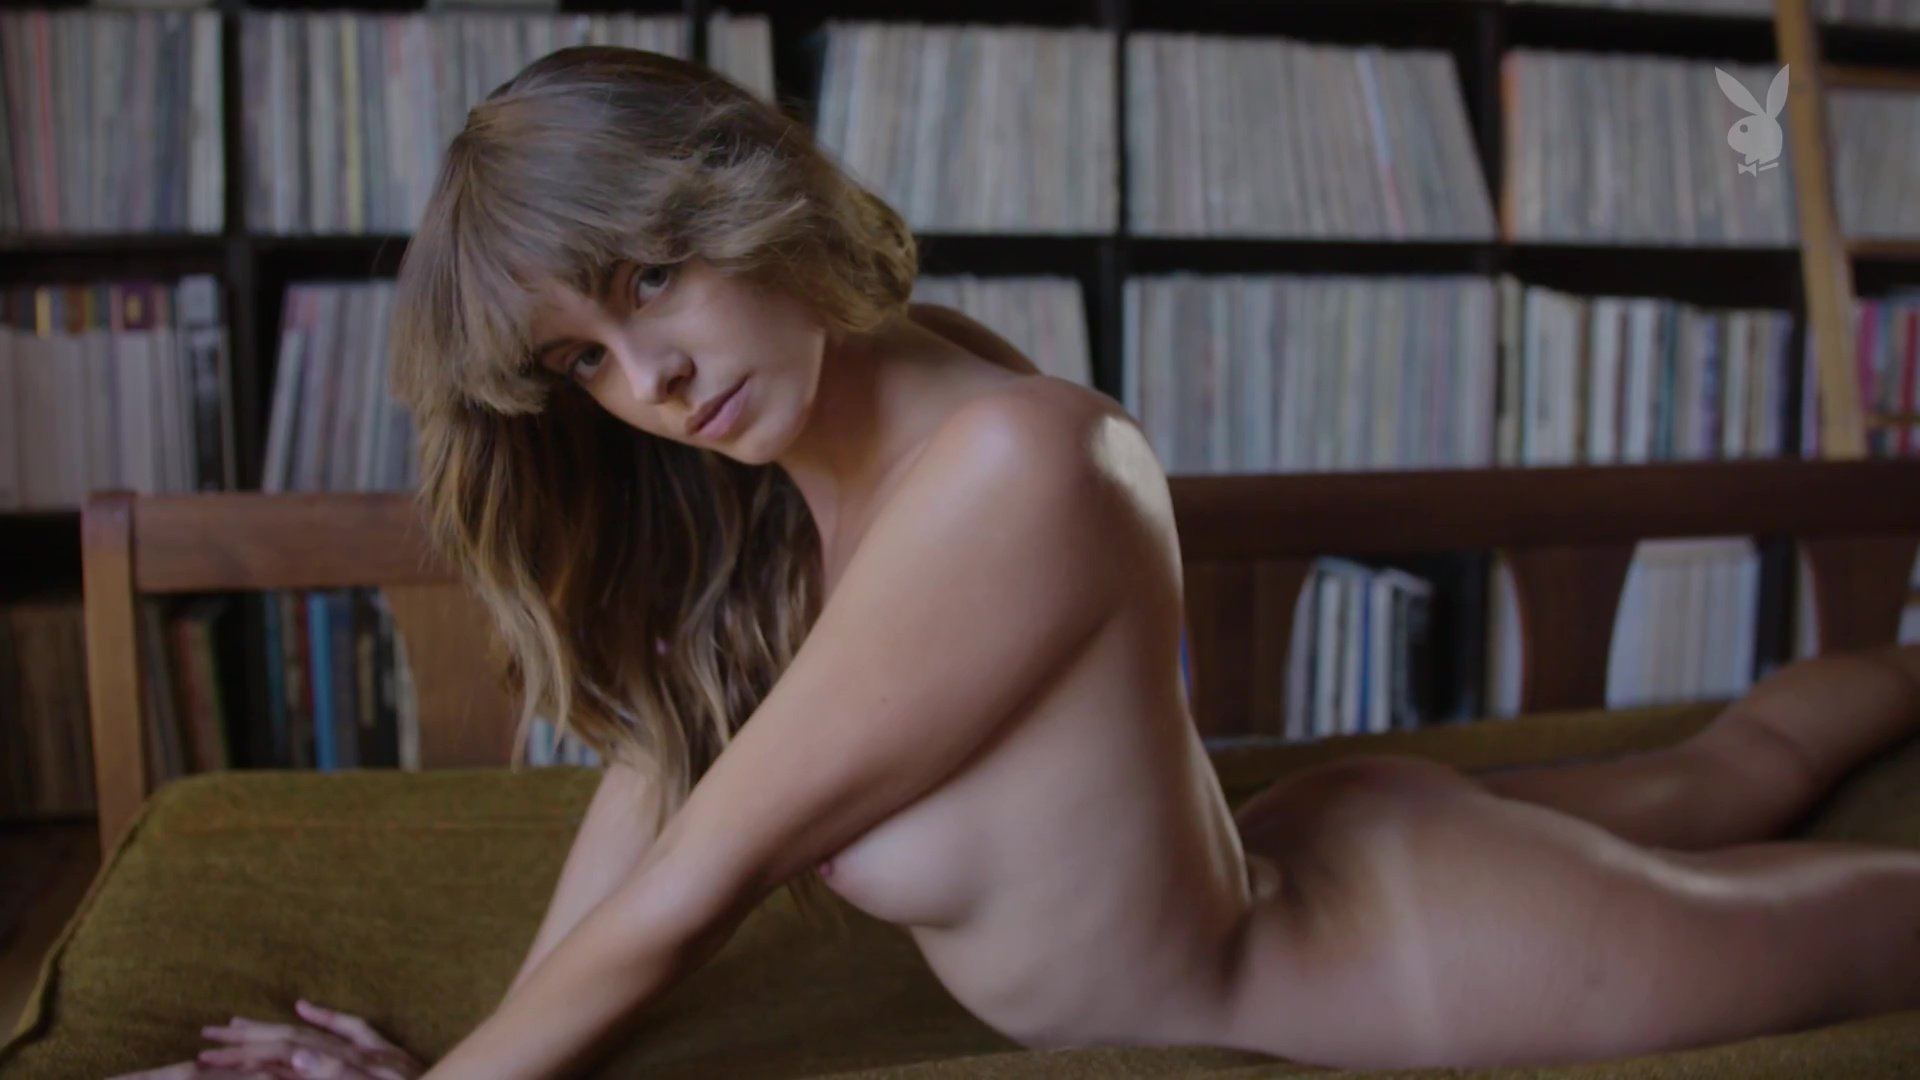 animated nude photos